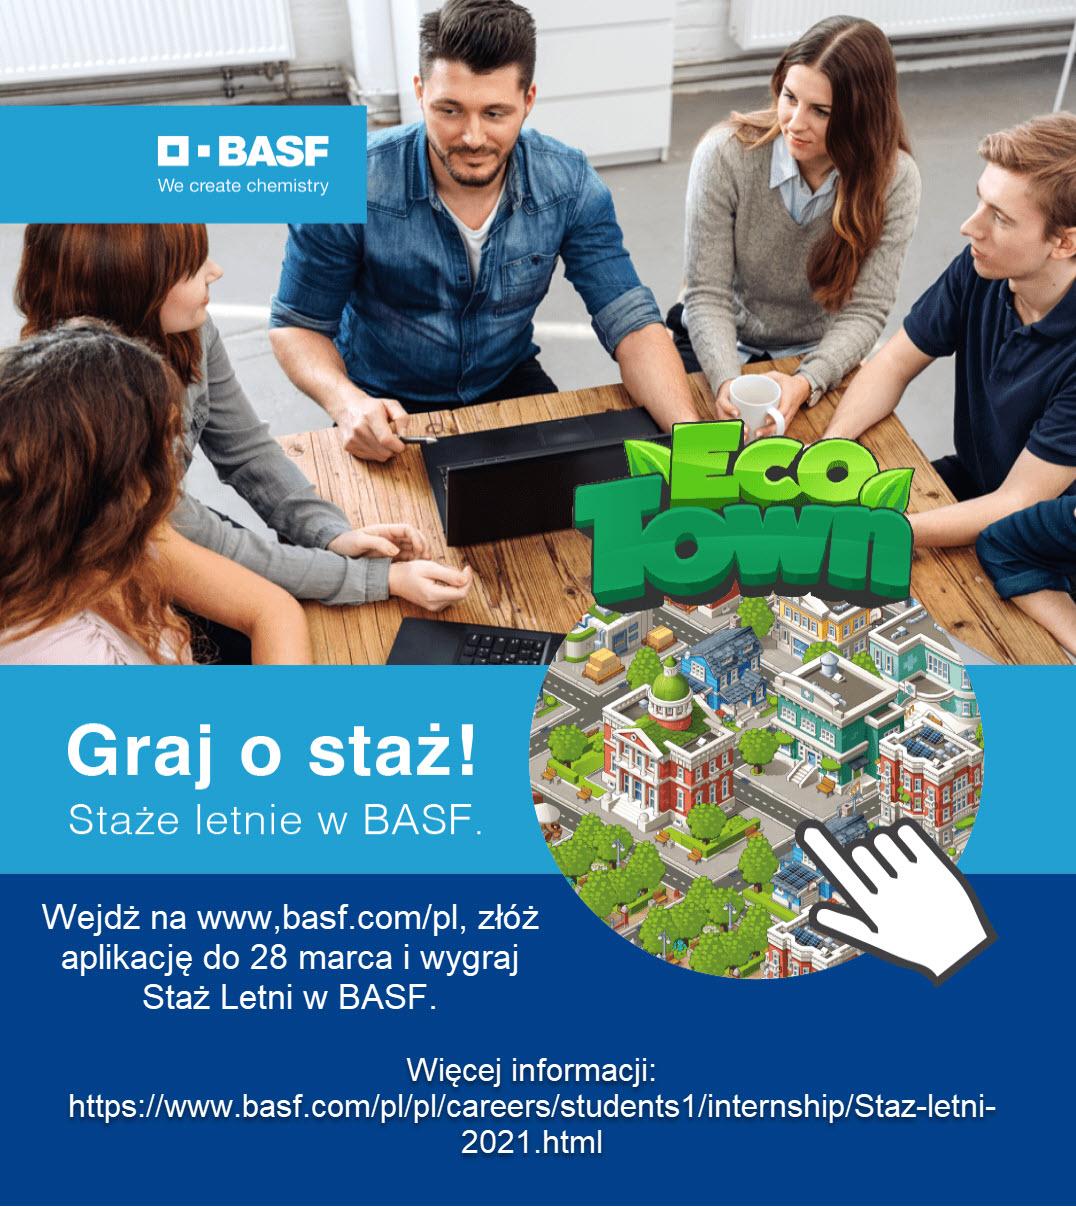 Graj o staż letni w BASF Polska!